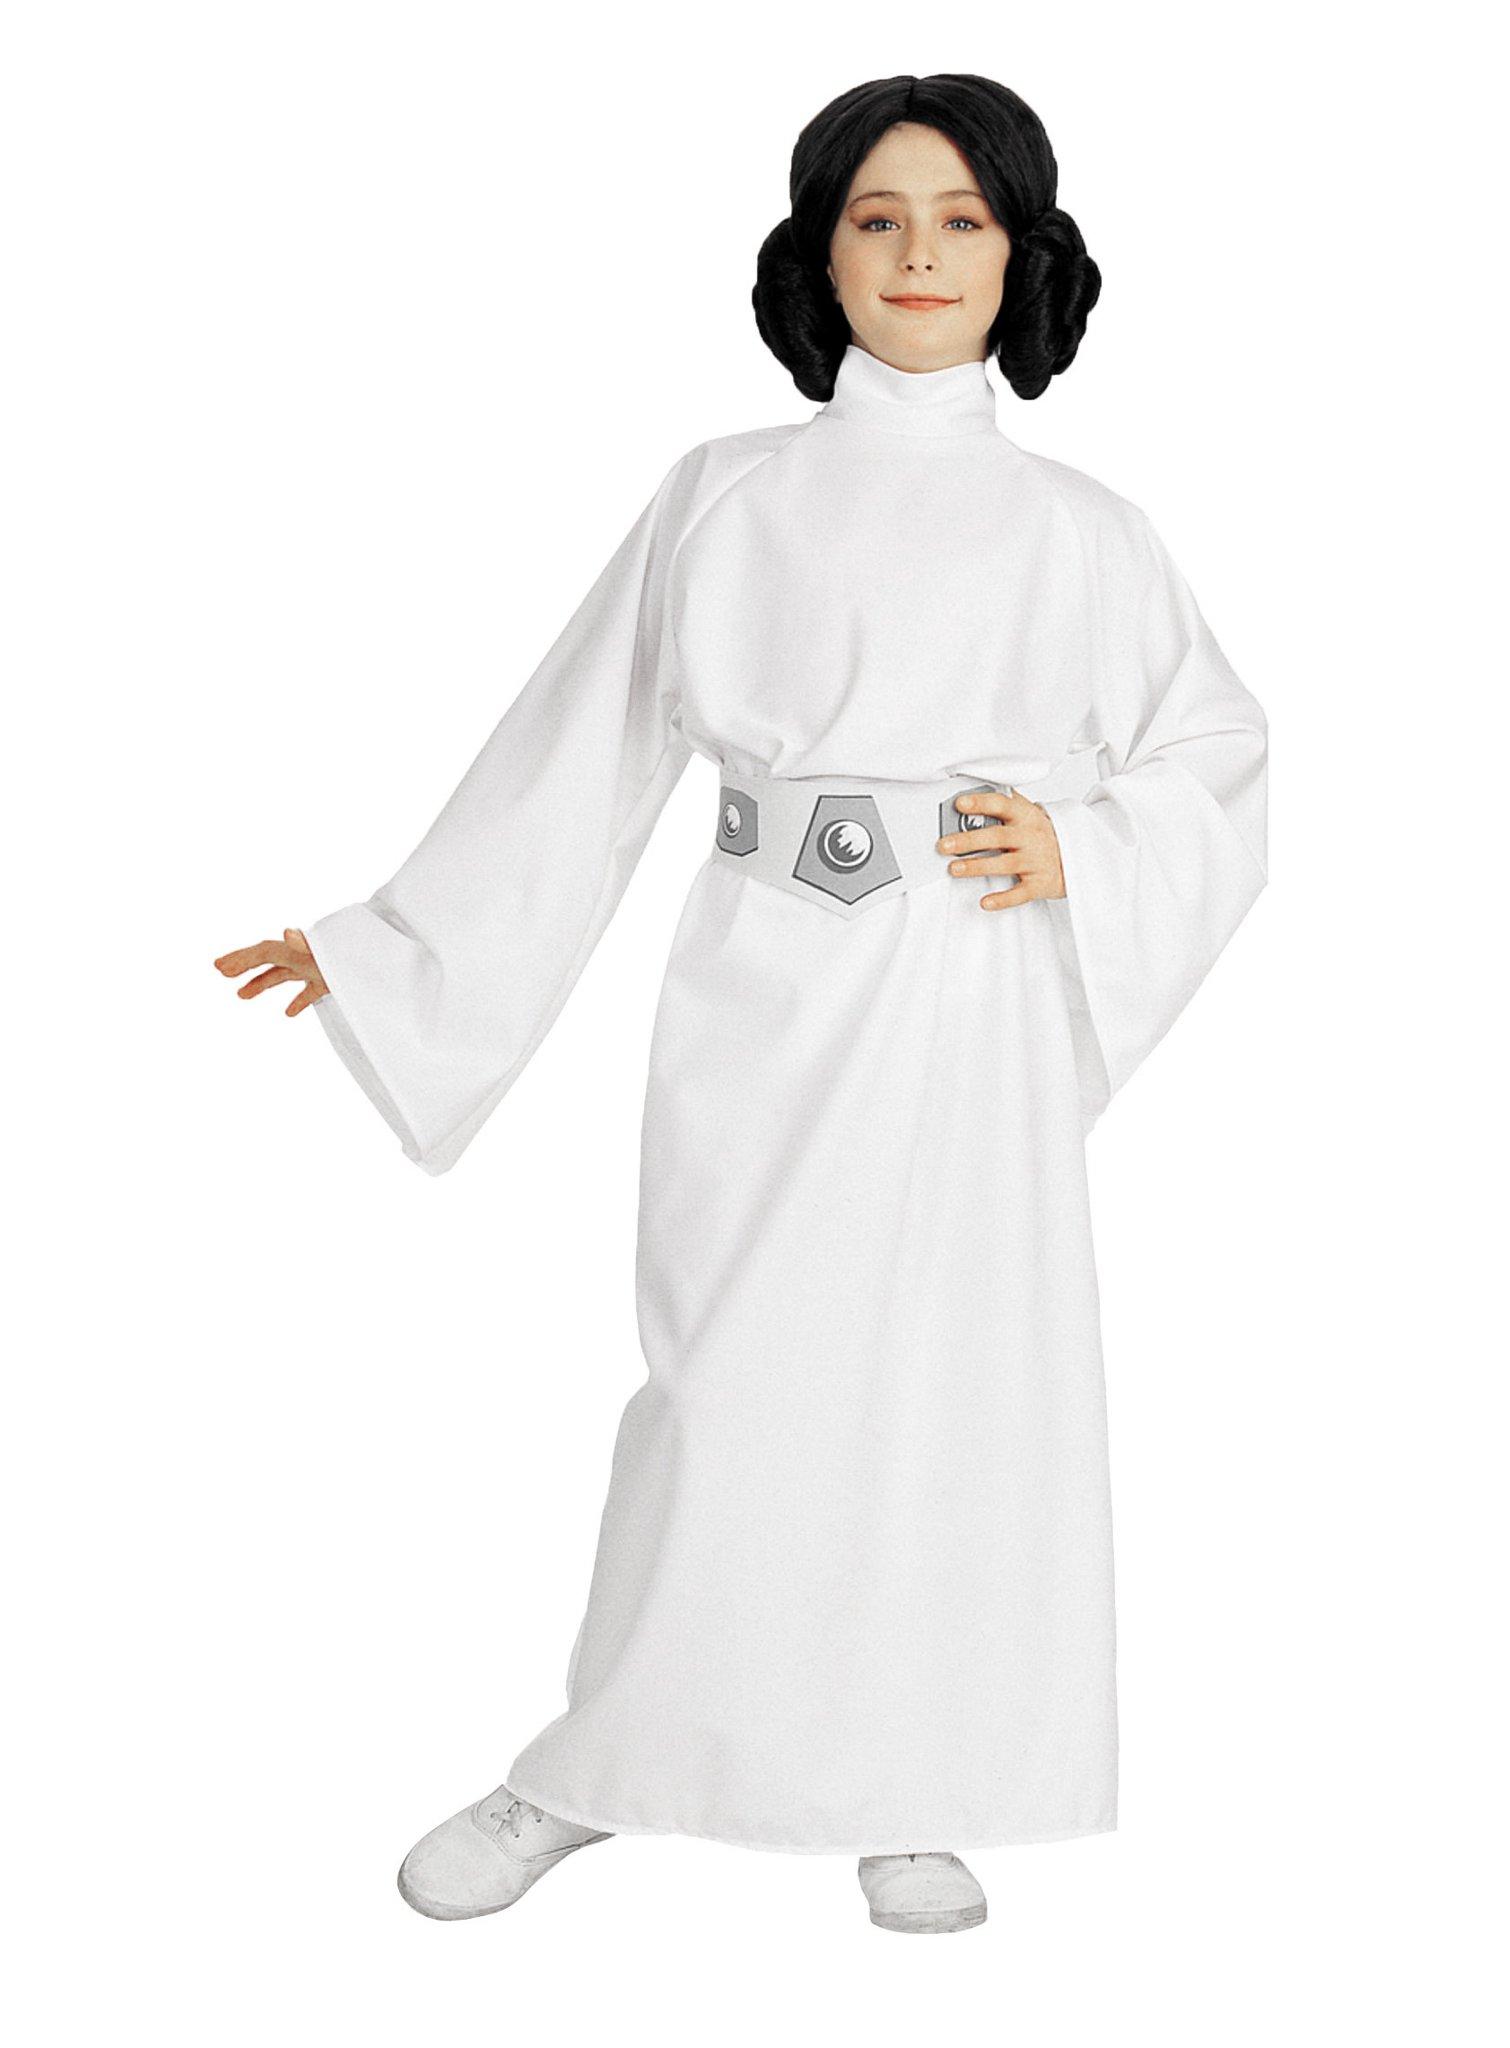 Star Wars Prinzessin Leia Kinderkostum Karneval Fasching Ebay